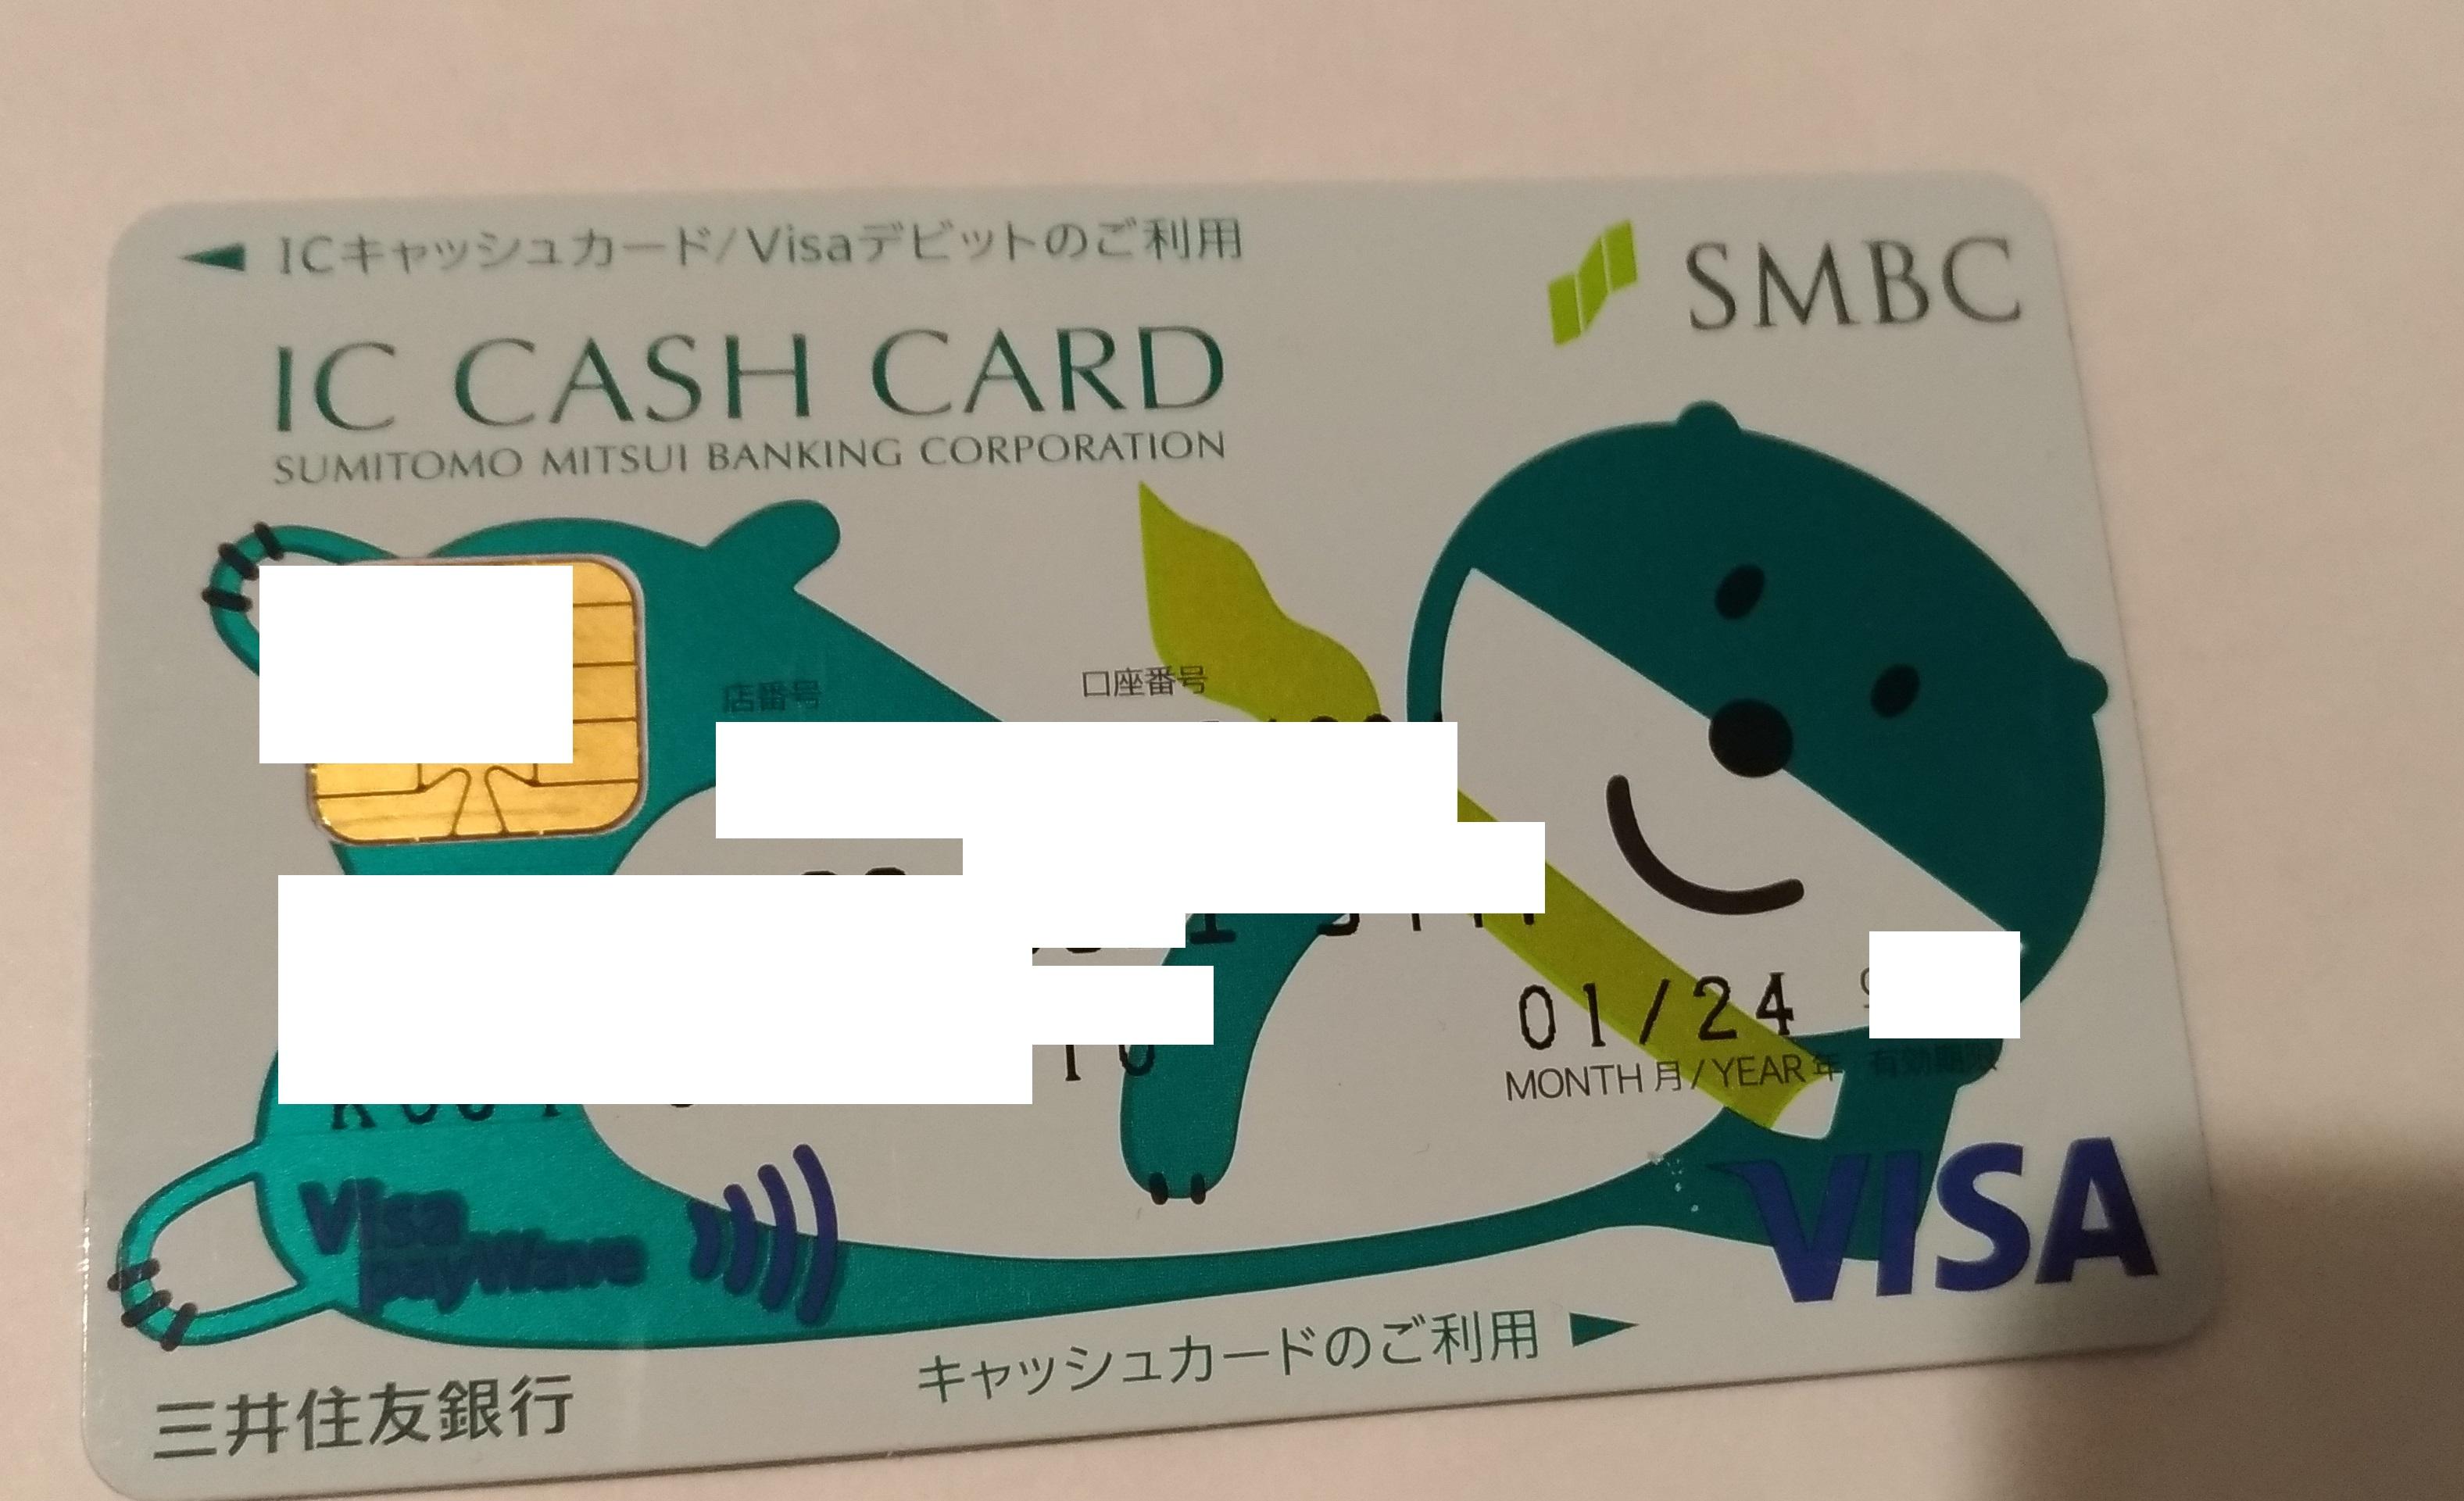 id_card_osakfu_1.jpg